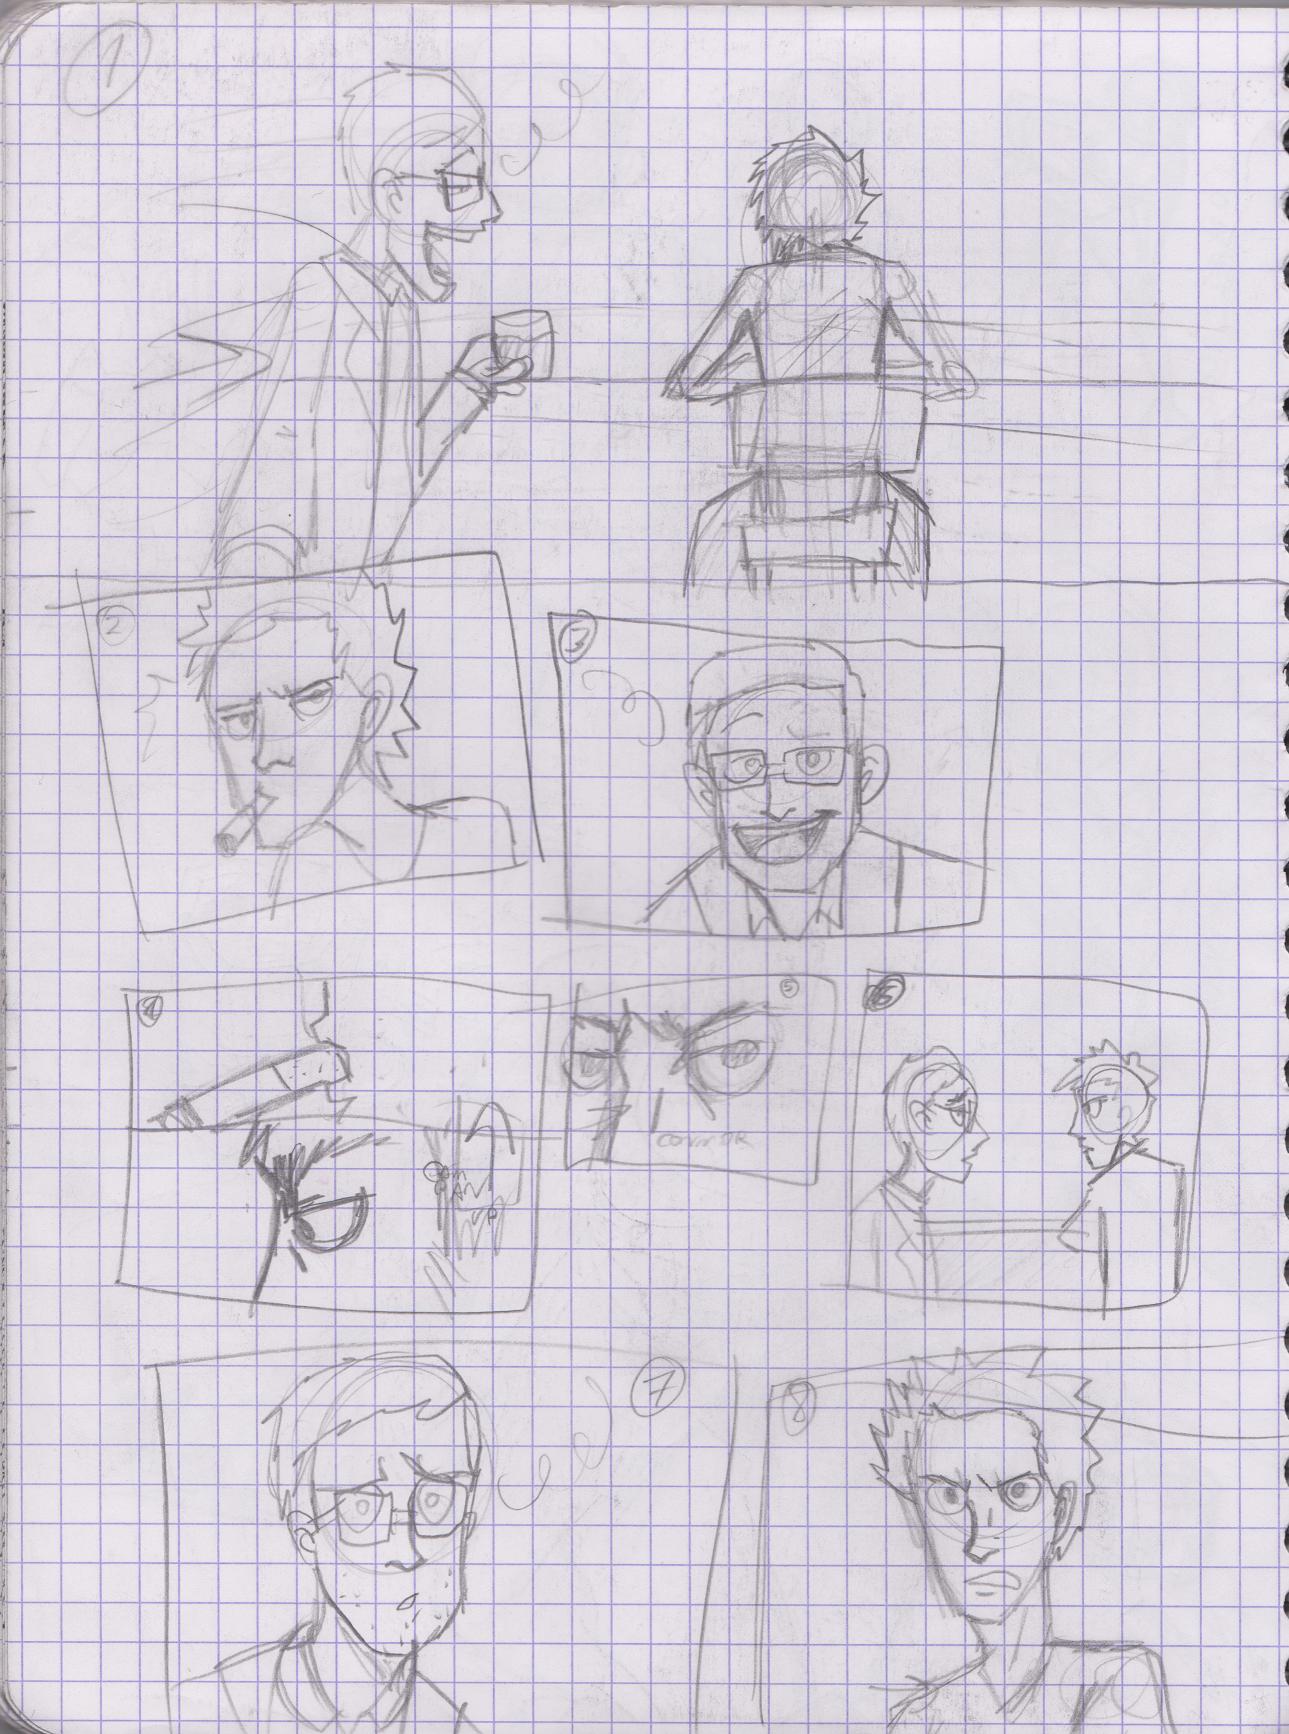 SH sketchbook page 52